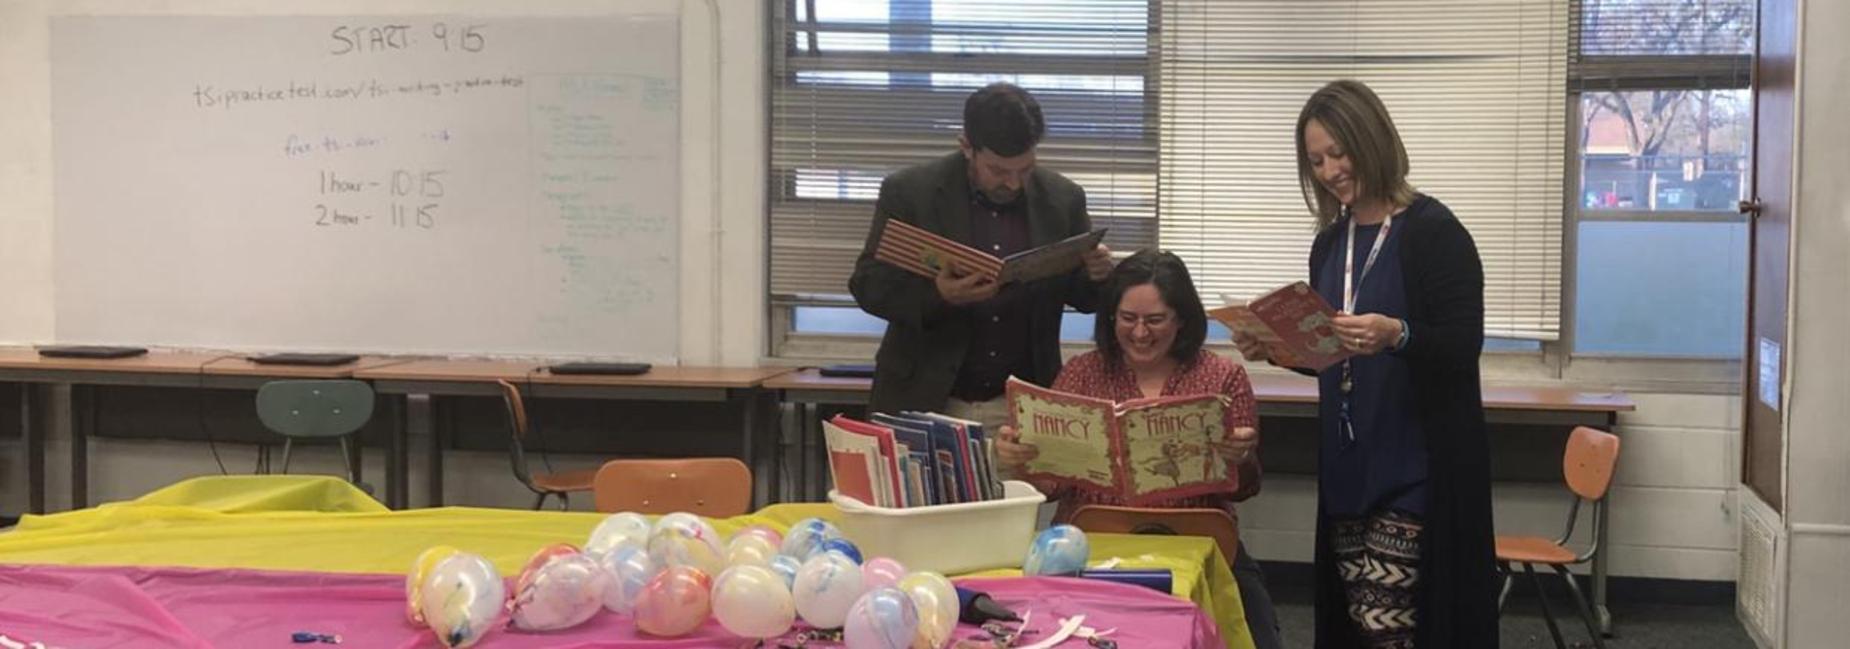 Family Literacy Night - Teachers reading